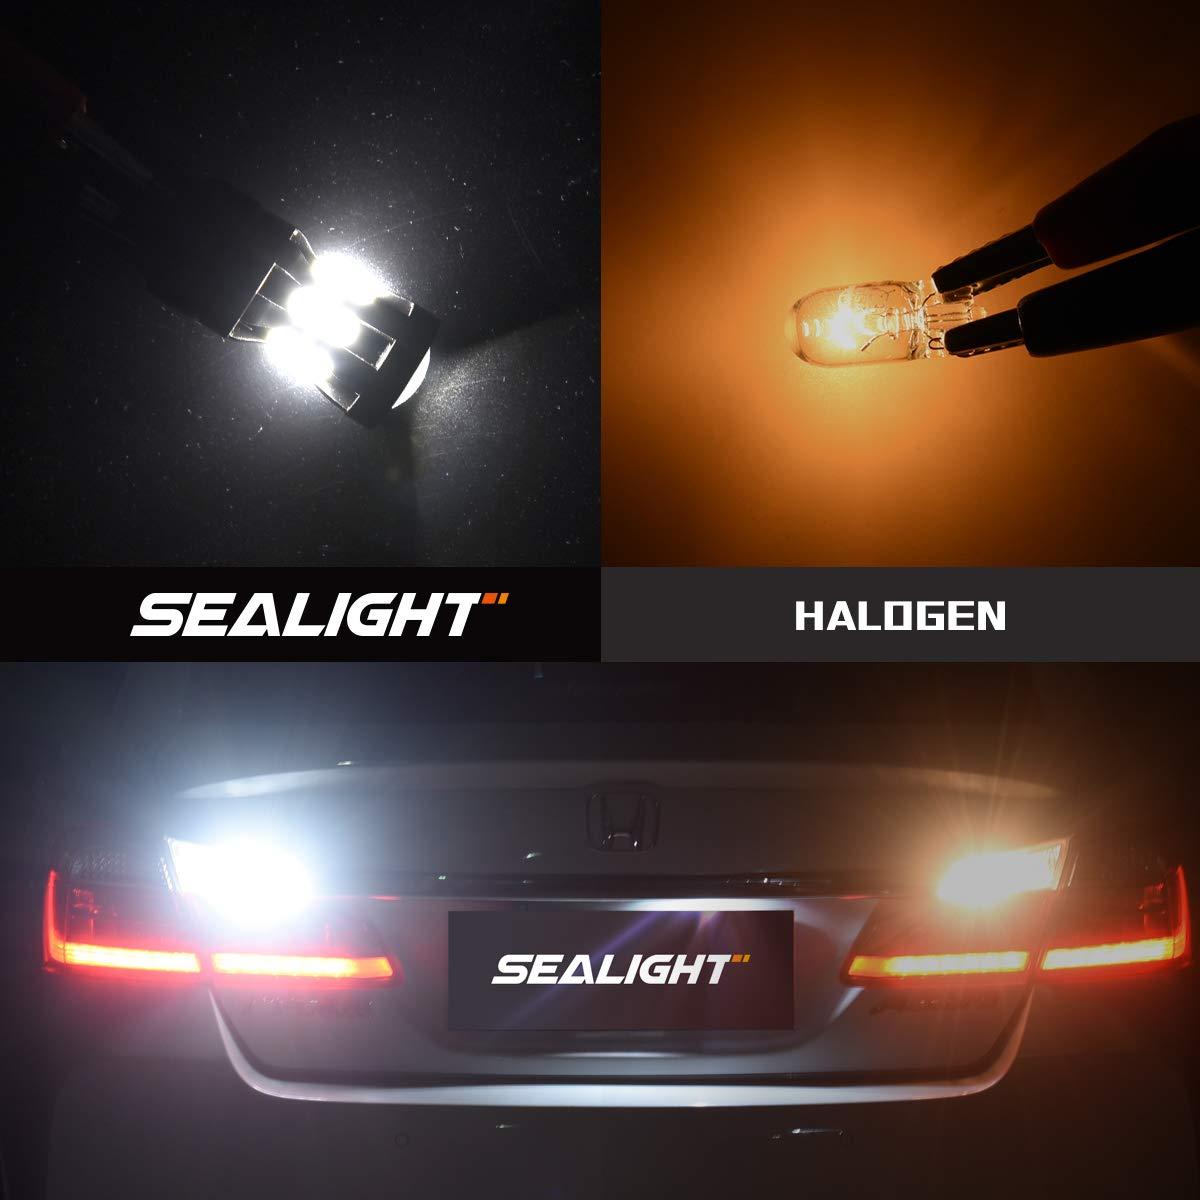 Pack of 2 Turn Signal LED-7440 T20 992 7441 7444 W21W LED Bulbs 7443 Reverse Tail Lights SEALIGHT 7443 LED Brake Lights 7443 LED Bulbs 7443 LED Backup Reverse Lights 6000K Super Bright White